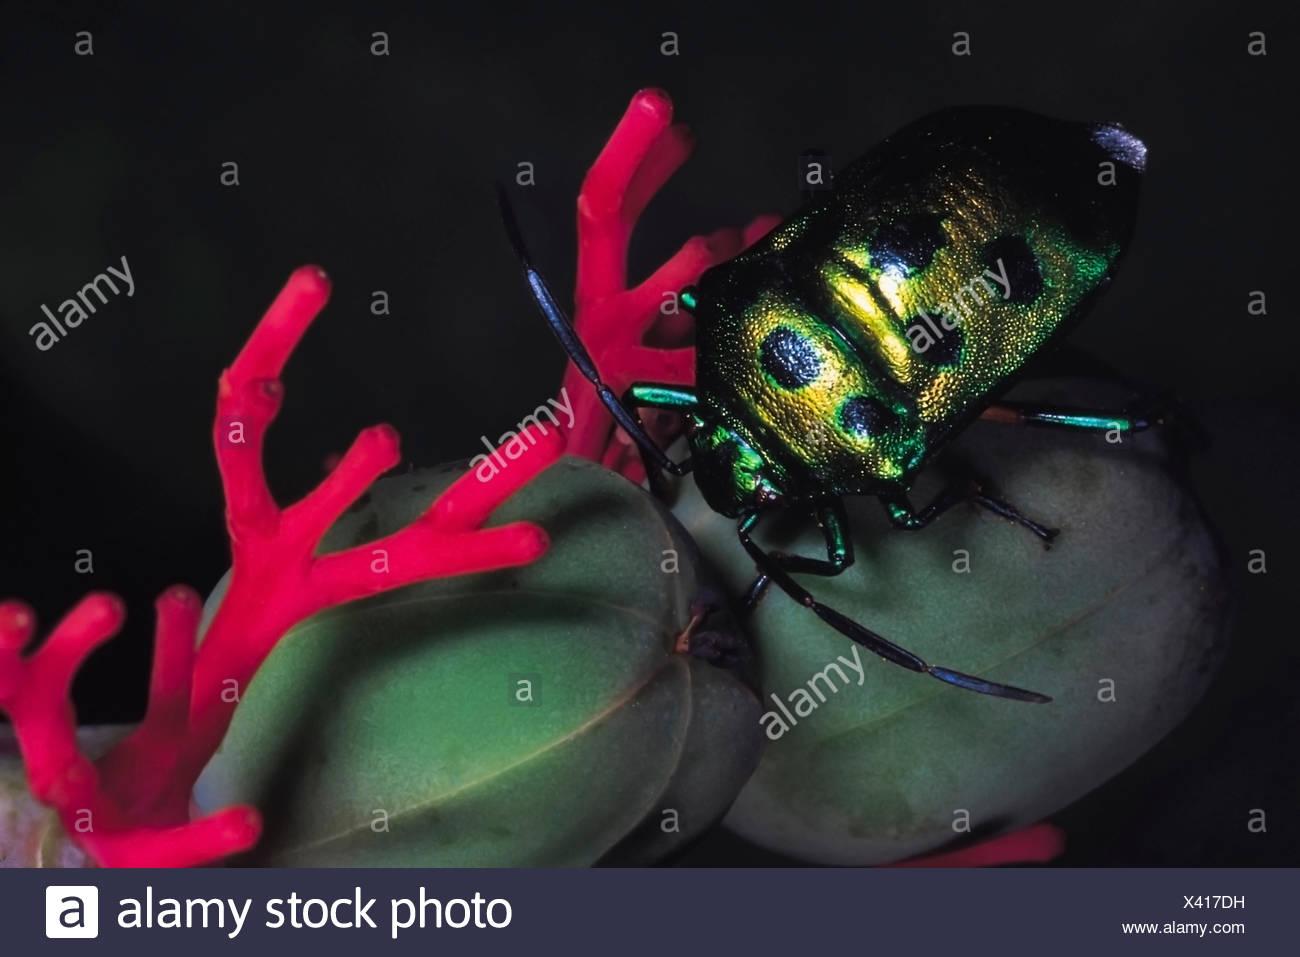 Jewel bug on Jatropa. Order: Hemiptera. Maharashtra, India. - Stock Image